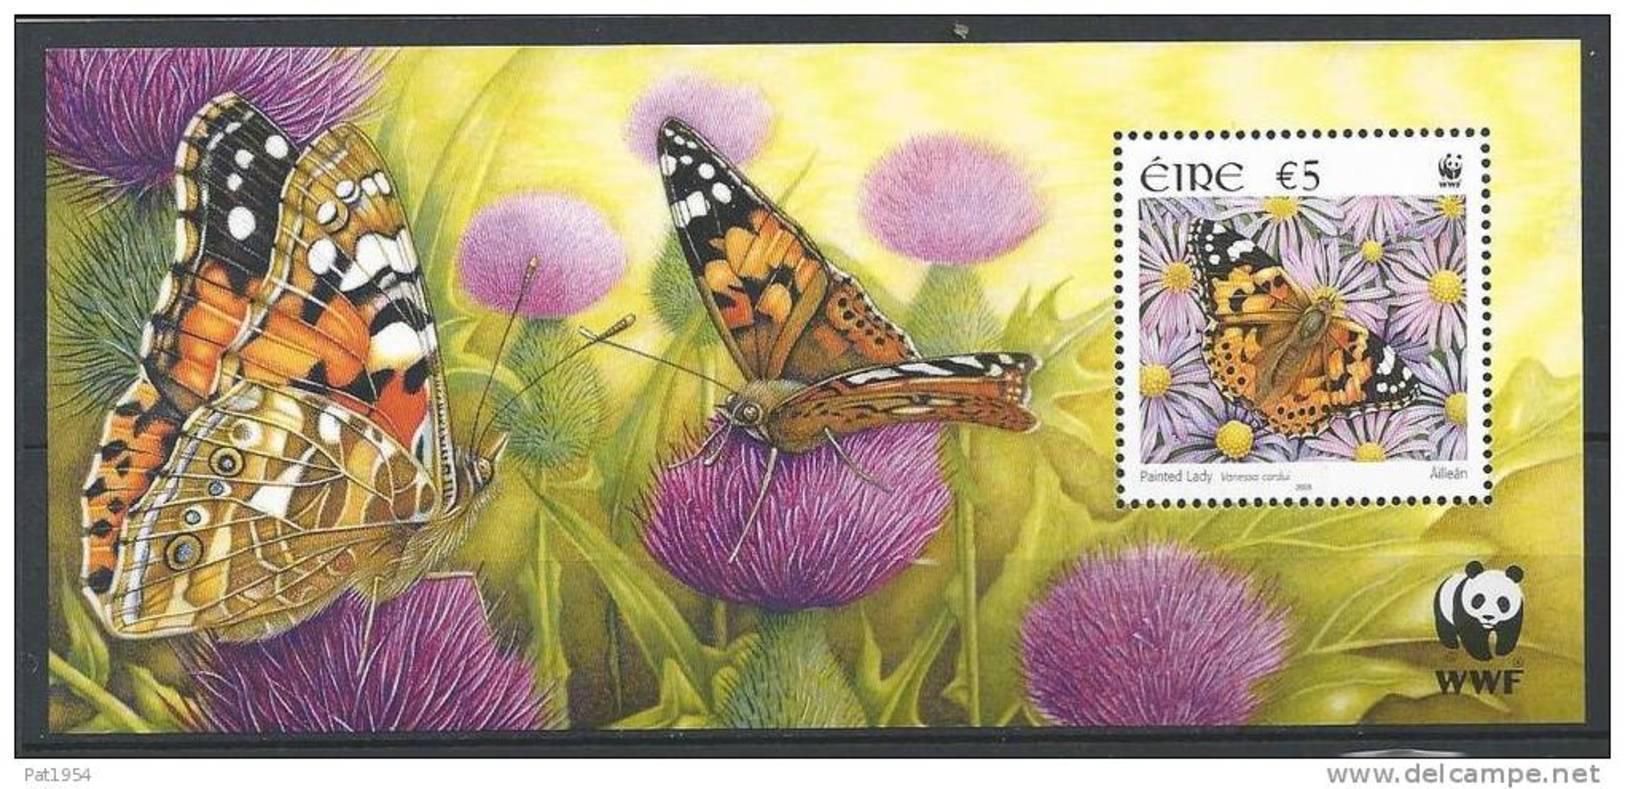 Irlande 2005 Bloc  N°58 Neuf Papillon - Blocs-feuillets